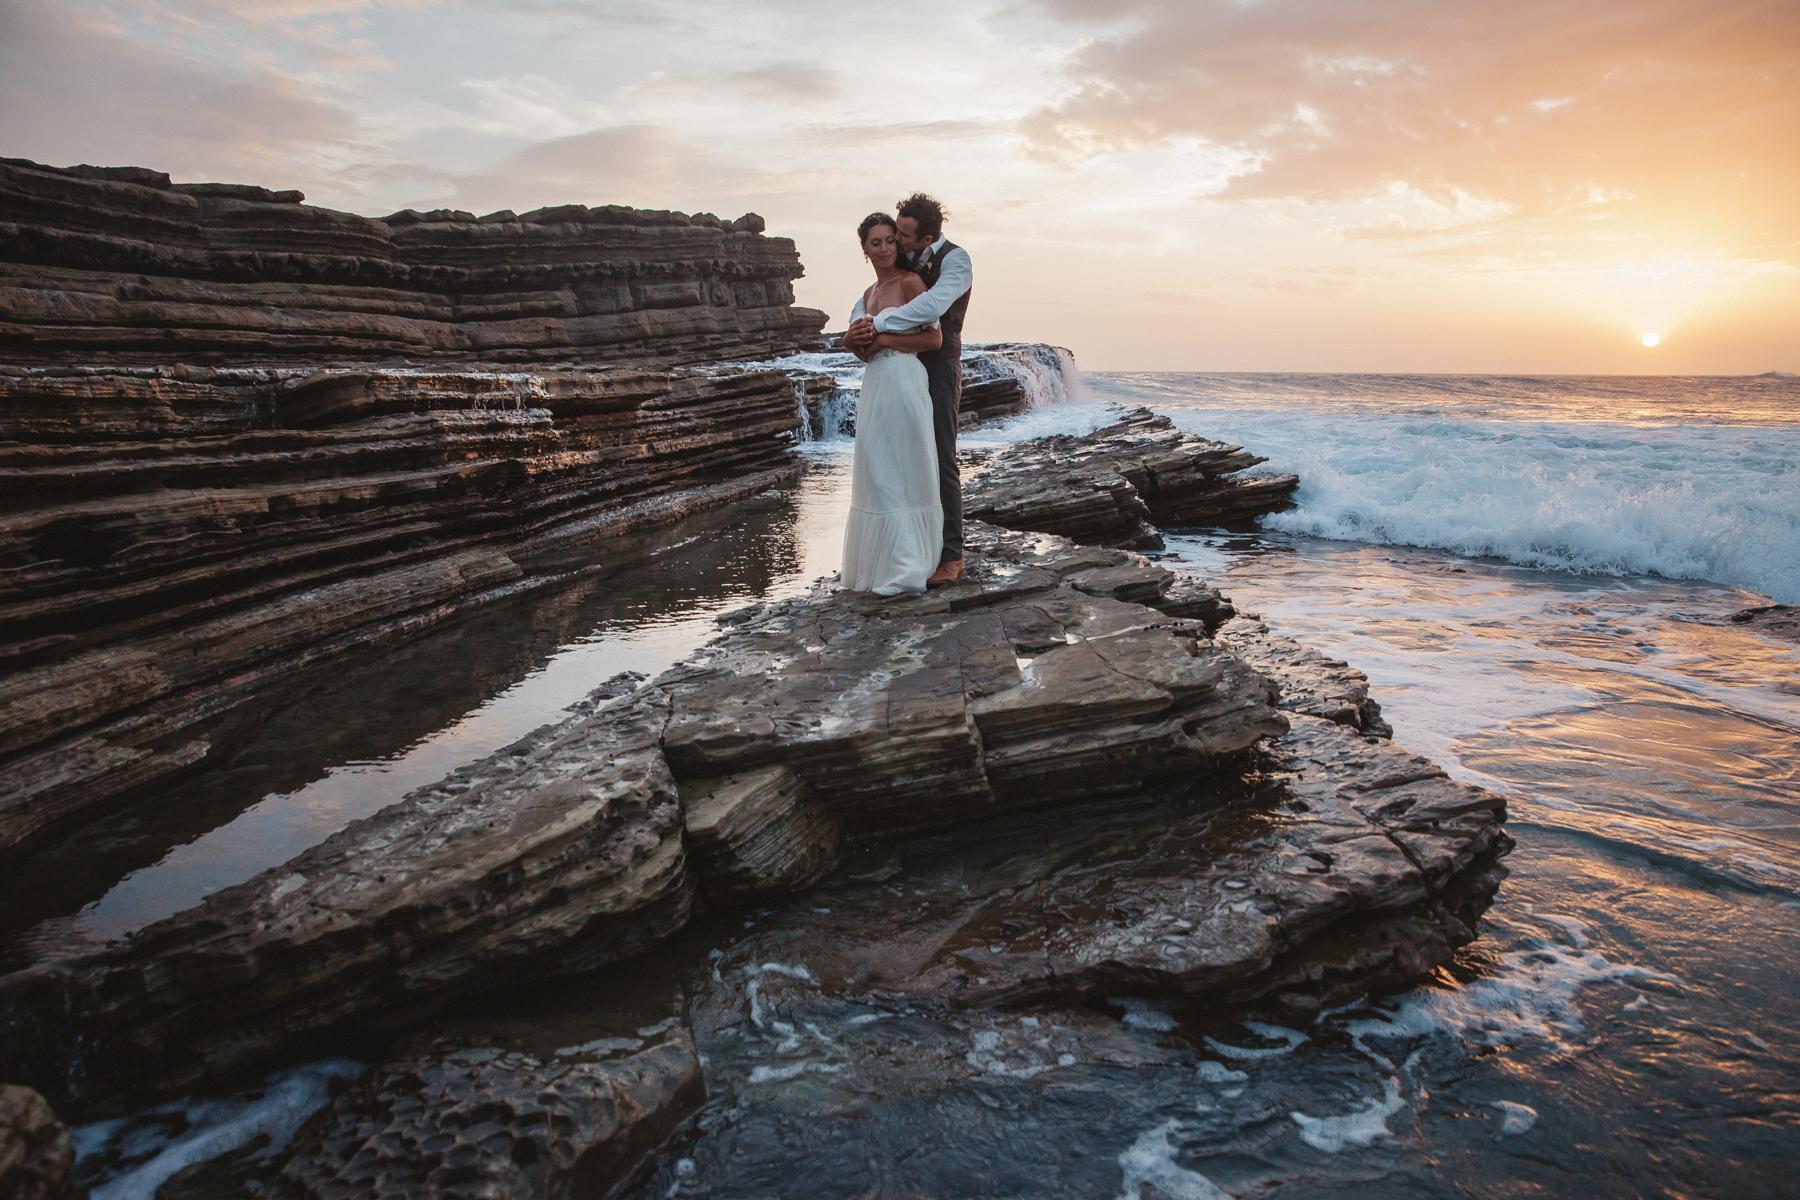 sunset wedding photos bride and groom embracing on oceanic rock